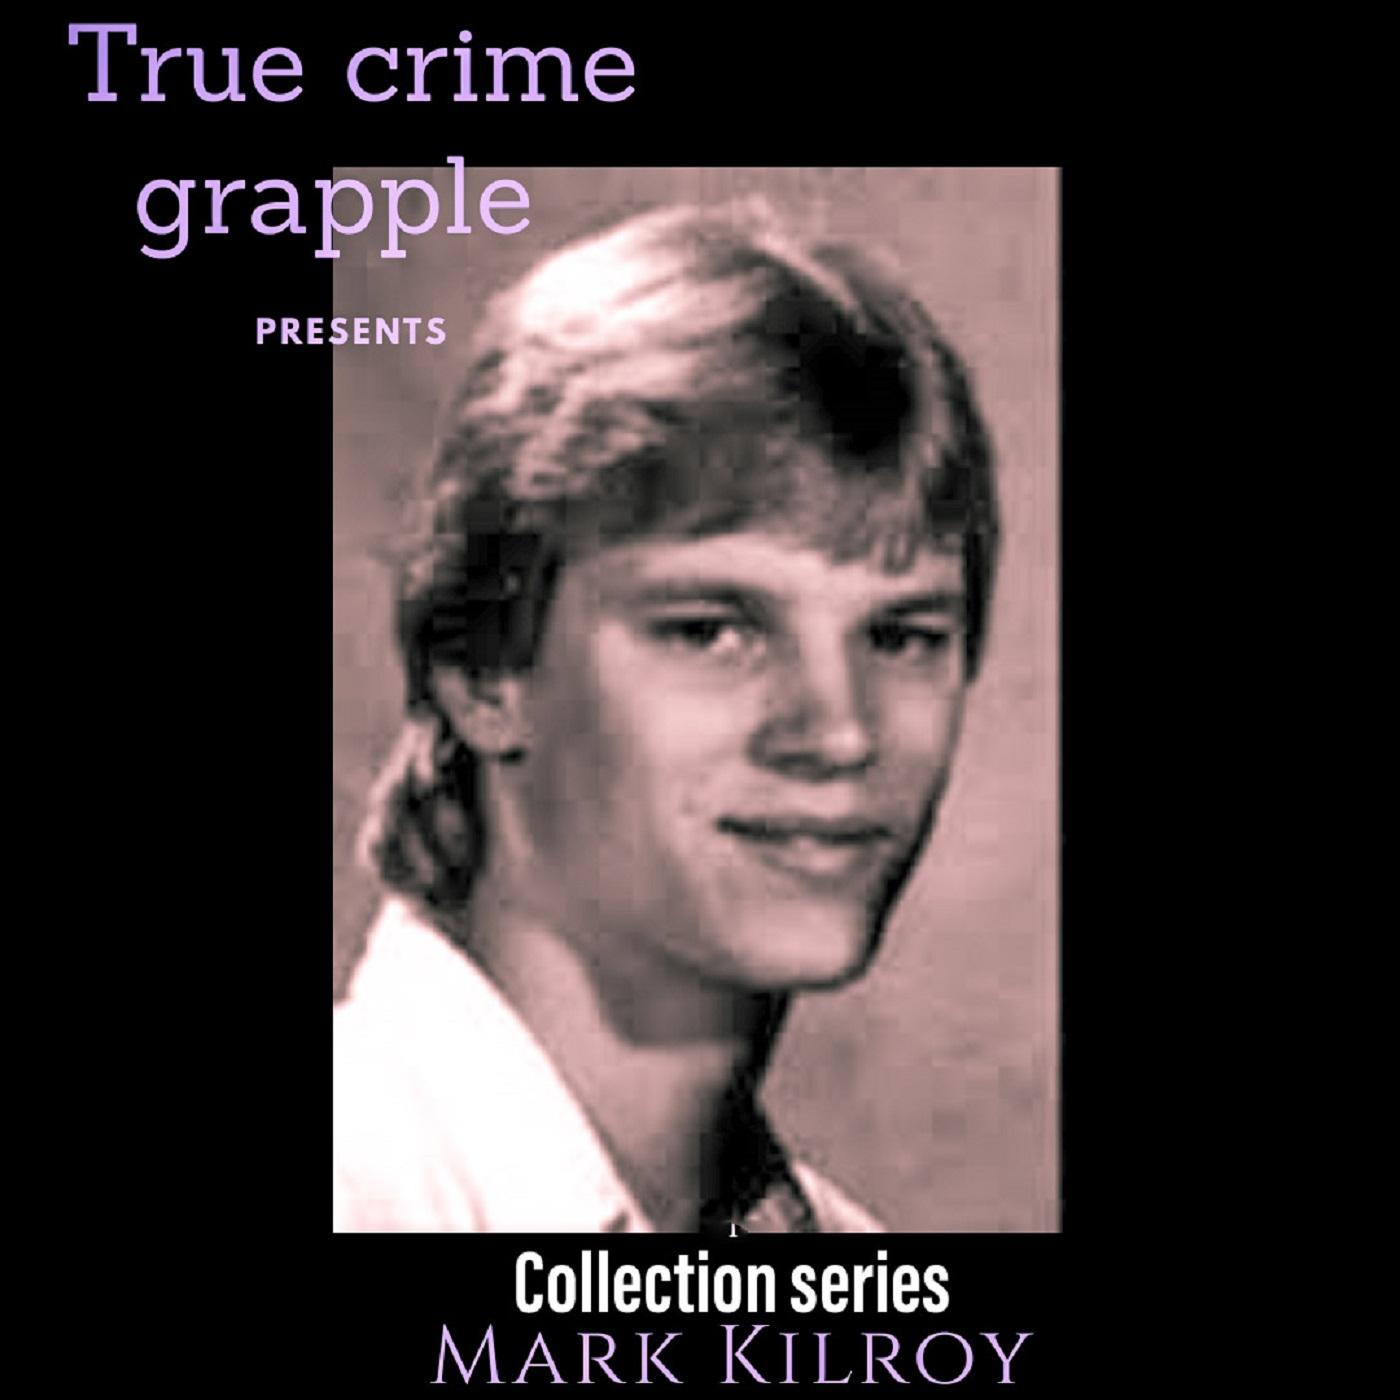 Artwork for podcast True crime grapple